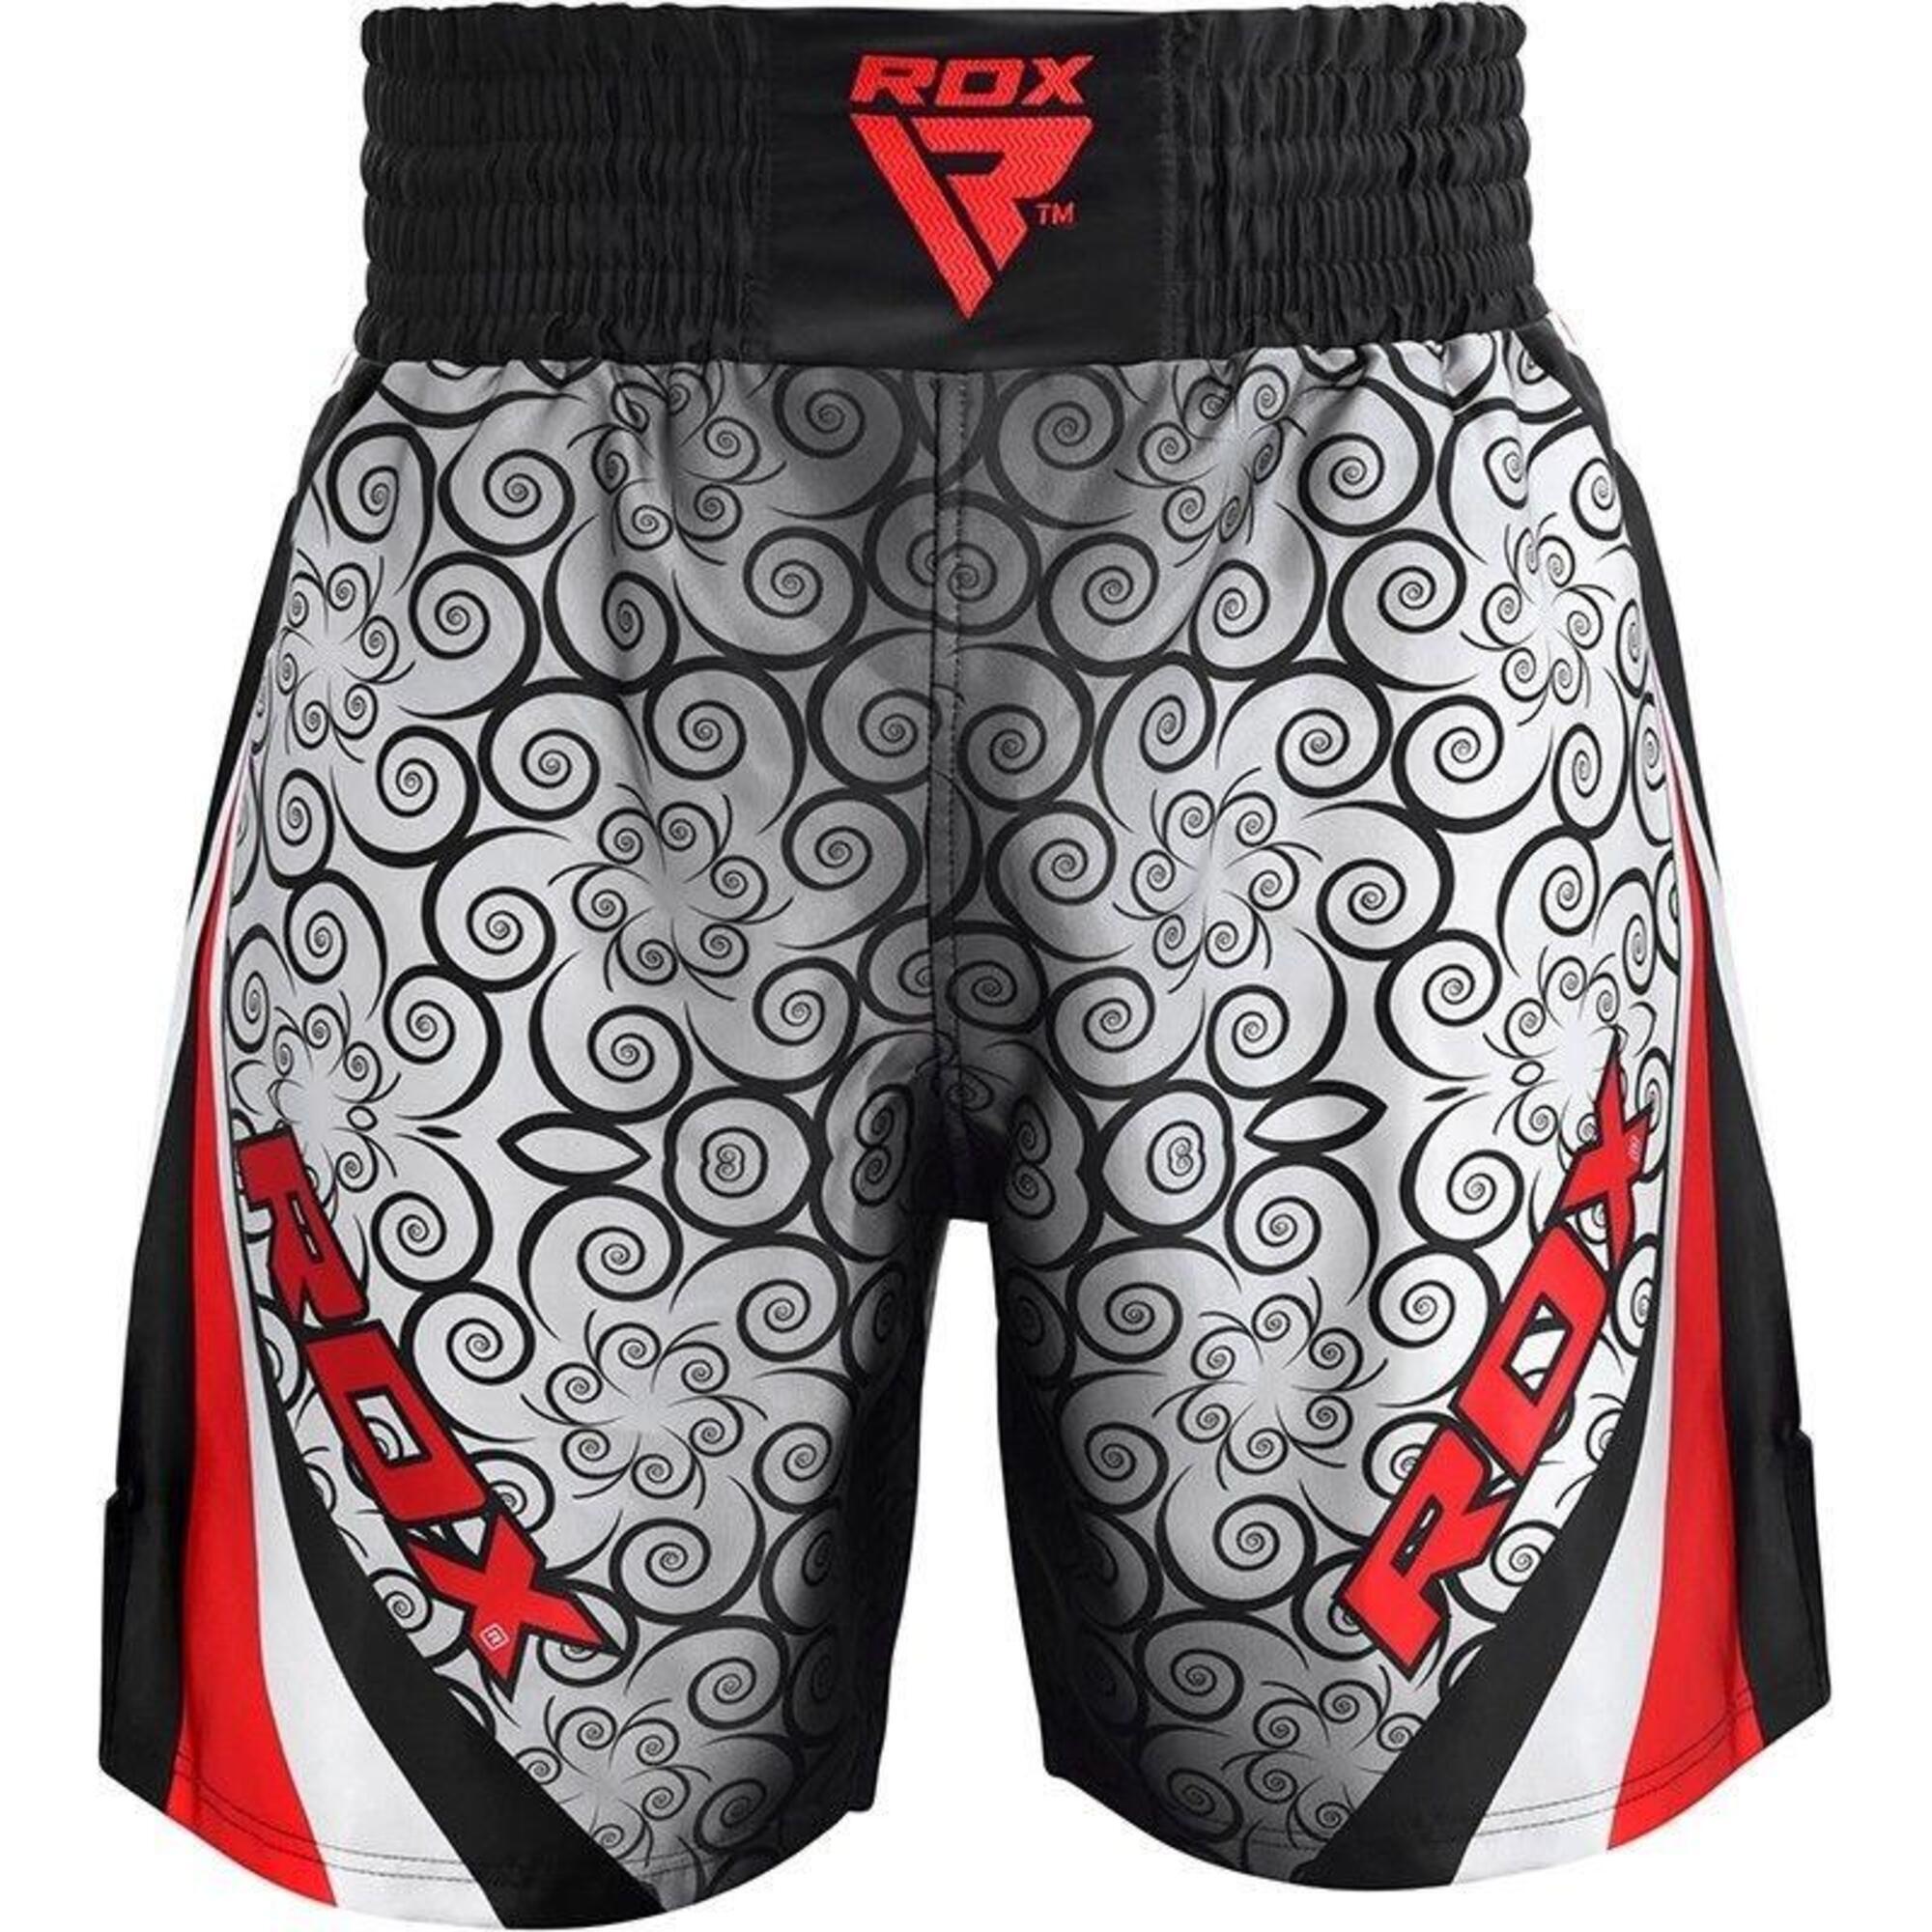 BSS Boxing Training Shorts Satin R1 - Rouge - 2XL